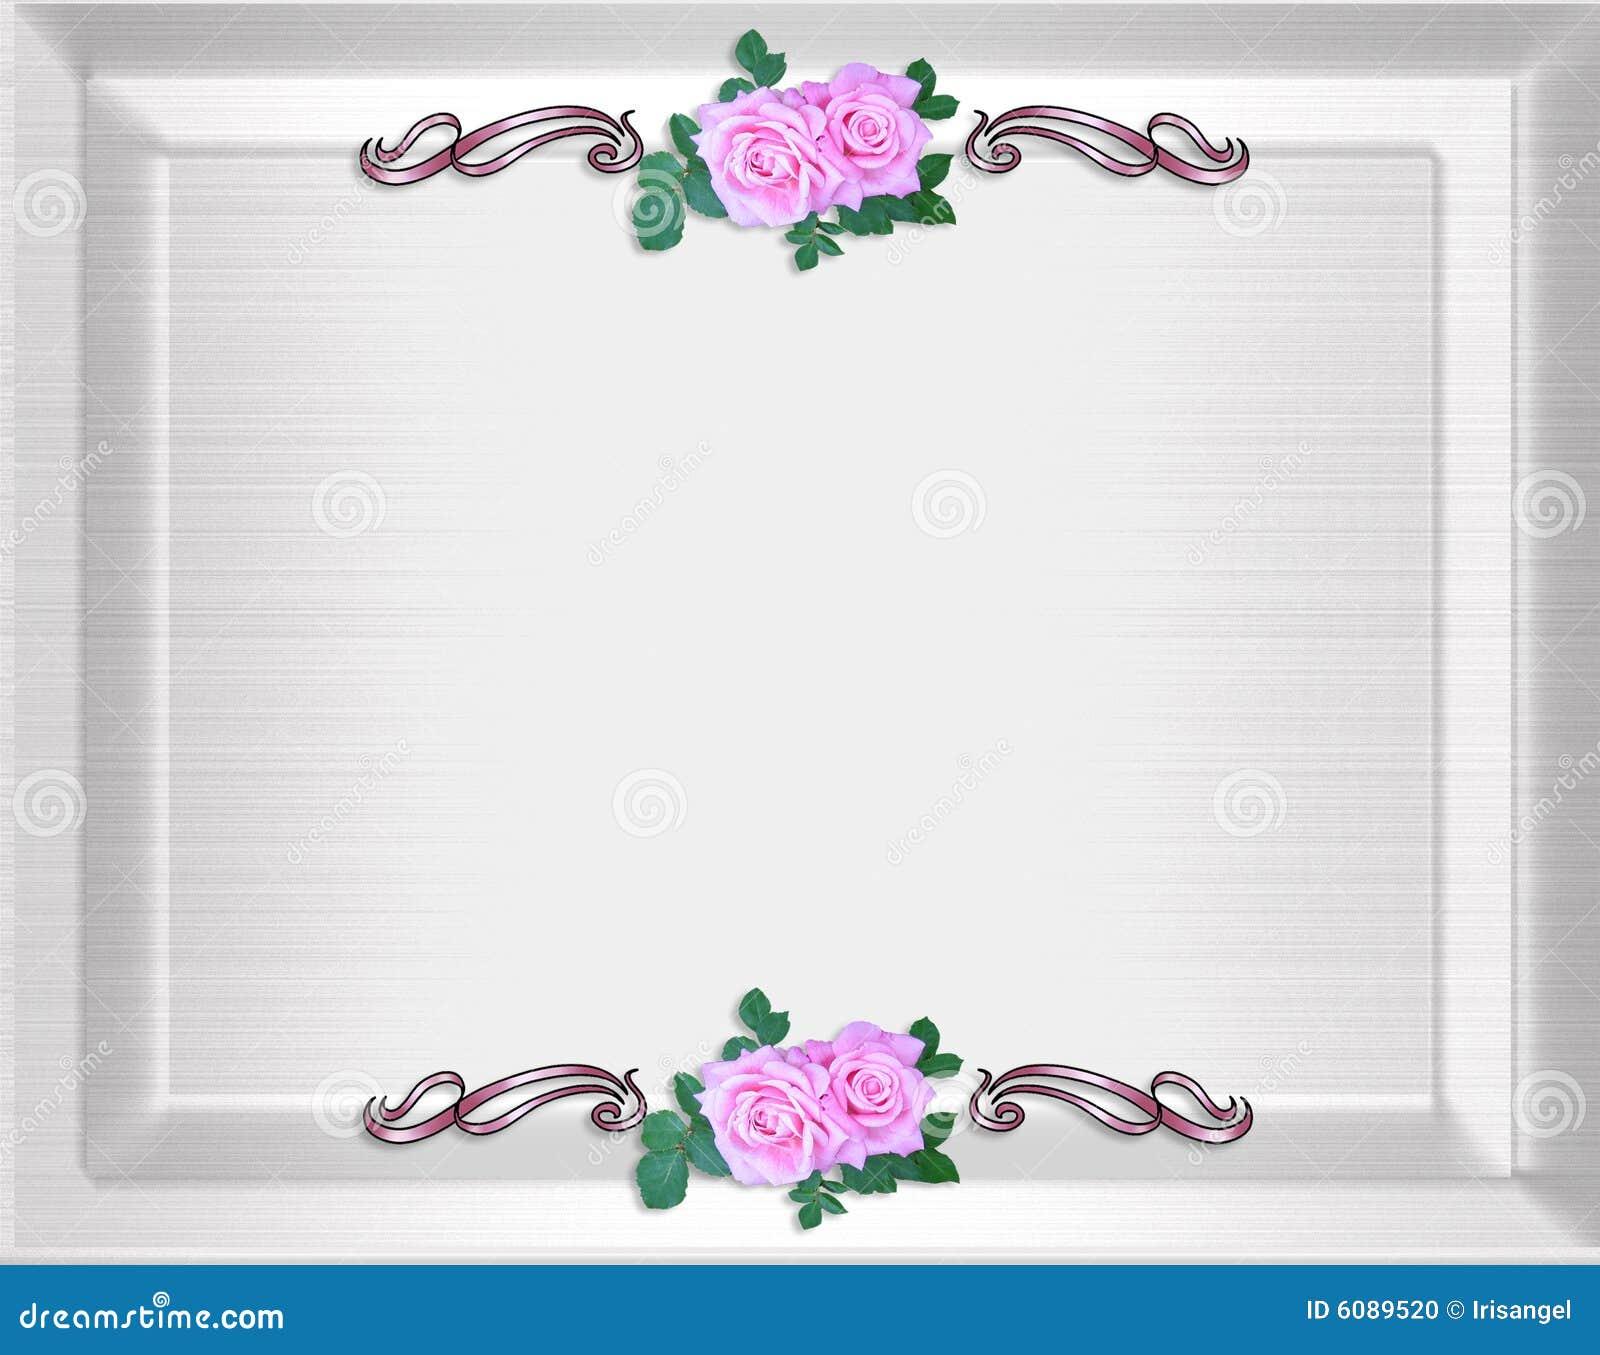 Border For Invitation Card Invitation Wedding Border: Roses Border Wedding Invitation Stock Photo